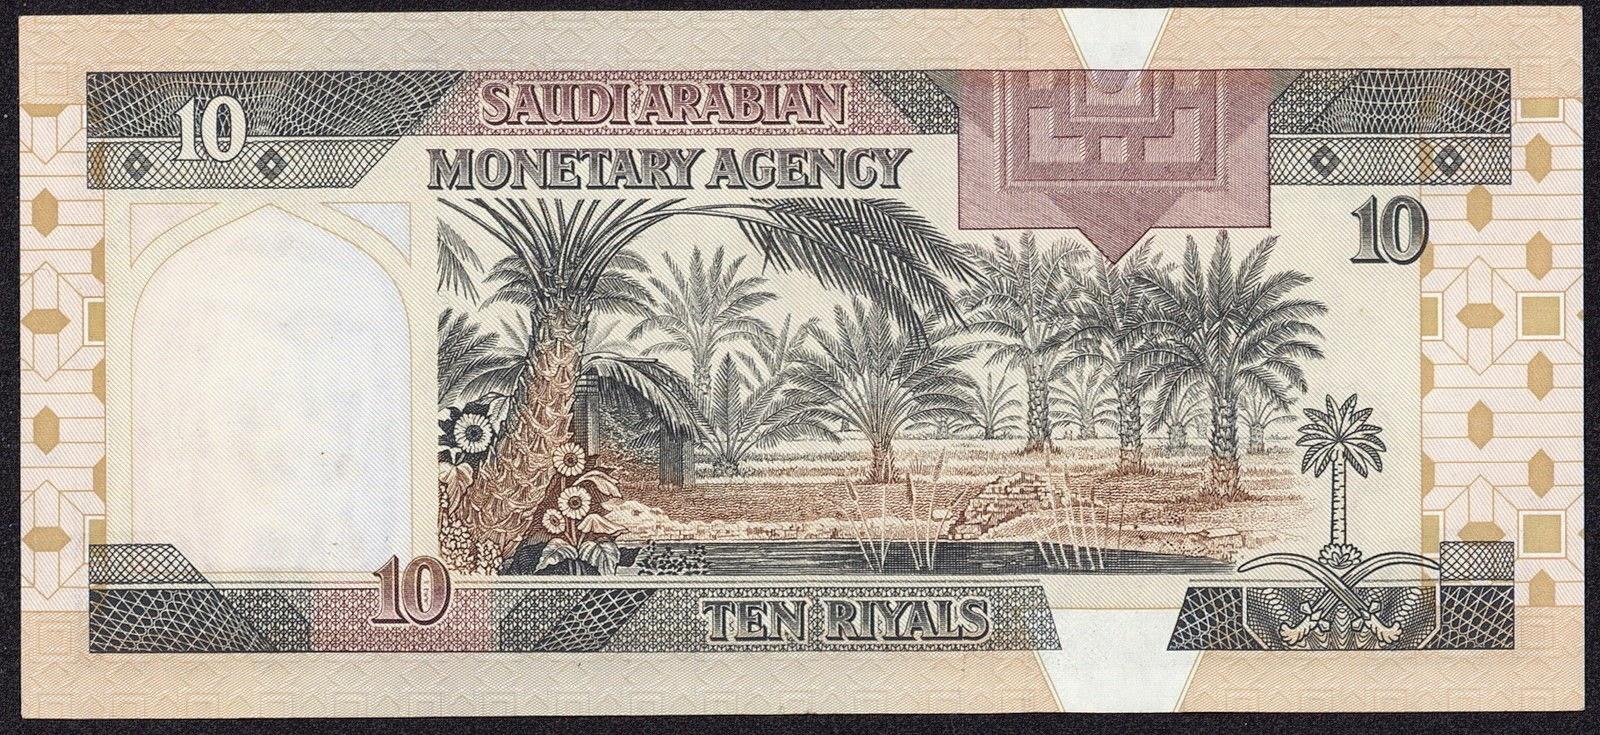 Saudi Arabia money currency 10 Riyals Note 1983